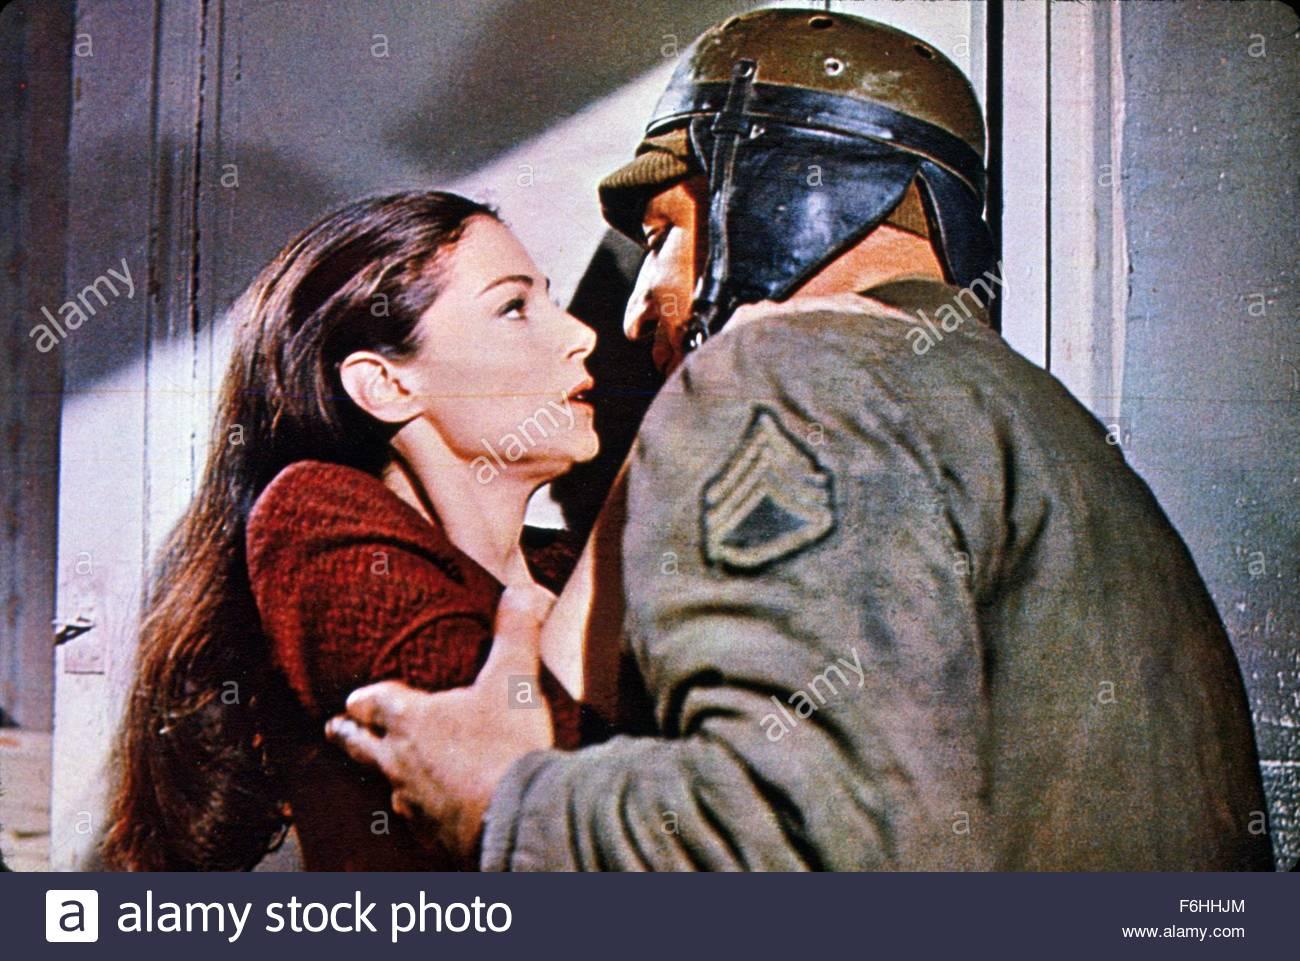 1965-film-title-battle-of-the-bulge-director-ken-annakin-studio-warner-F6HHJM.jpg